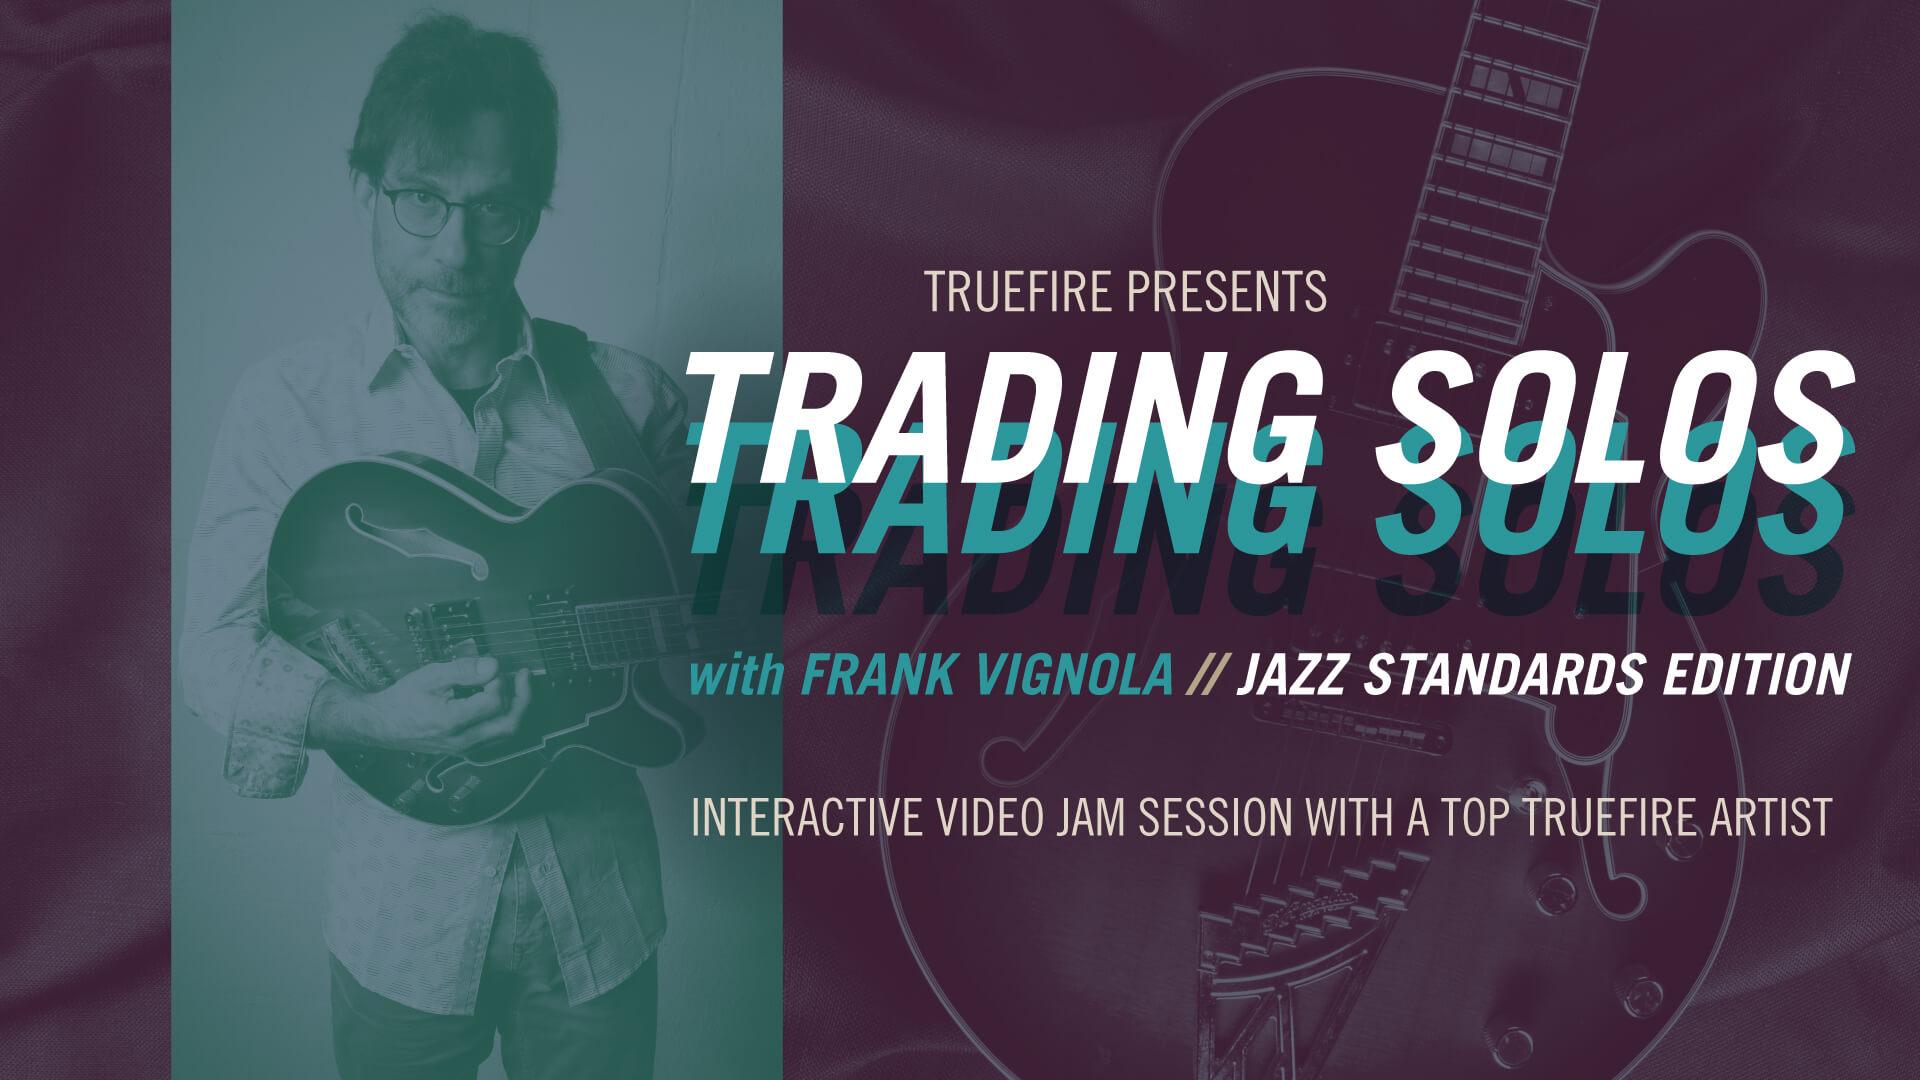 Trading Solos: Jazz Standards - Frank Vignola - Guitar Lessons